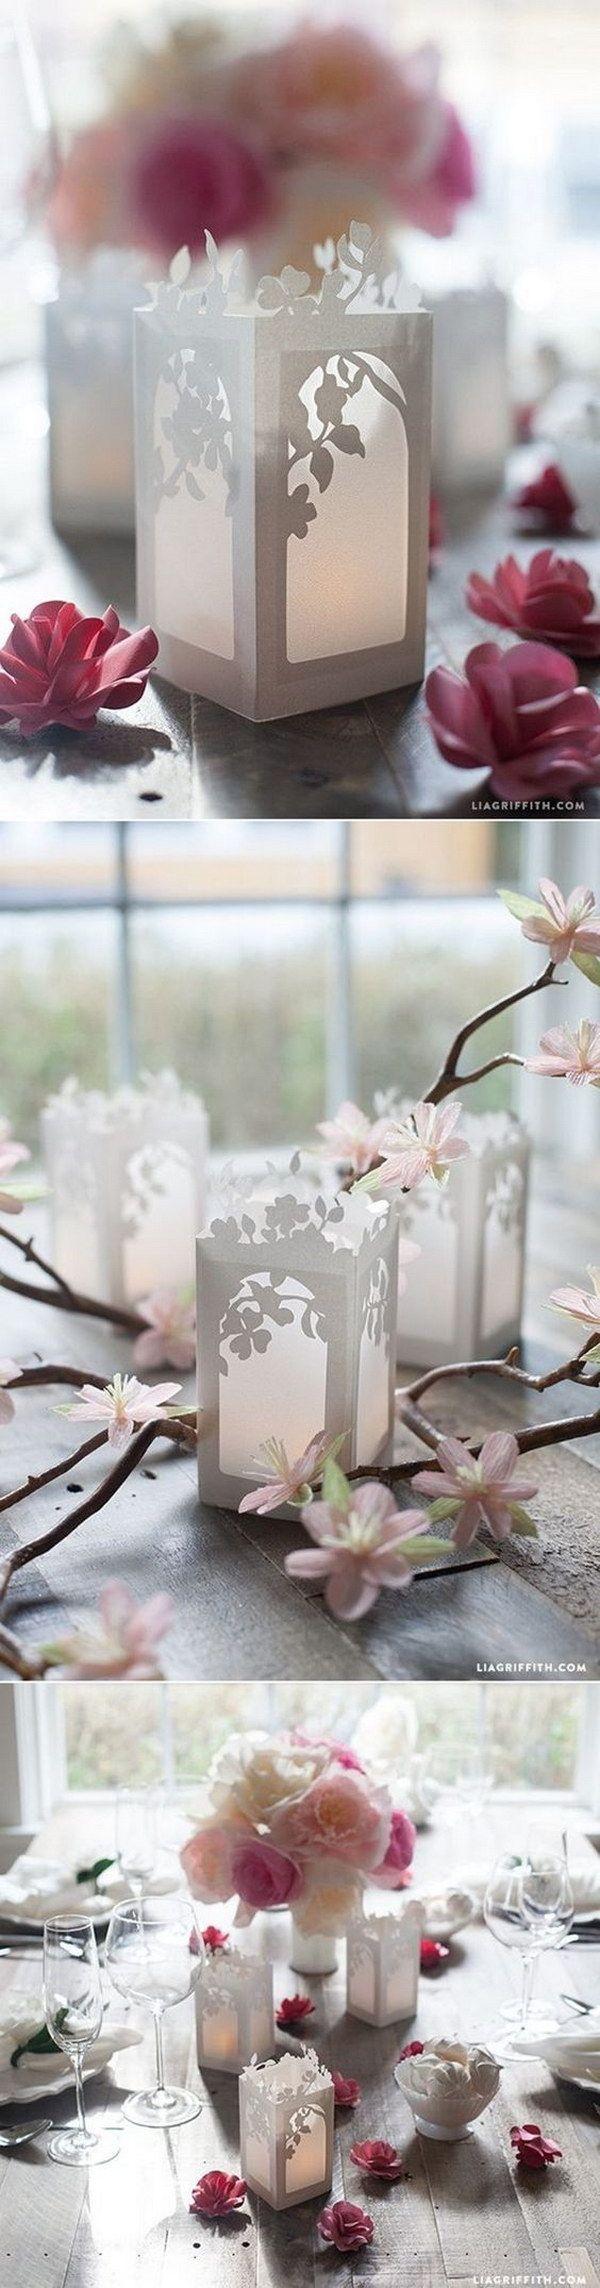 Best paper lantern decorations ideas on pinterest